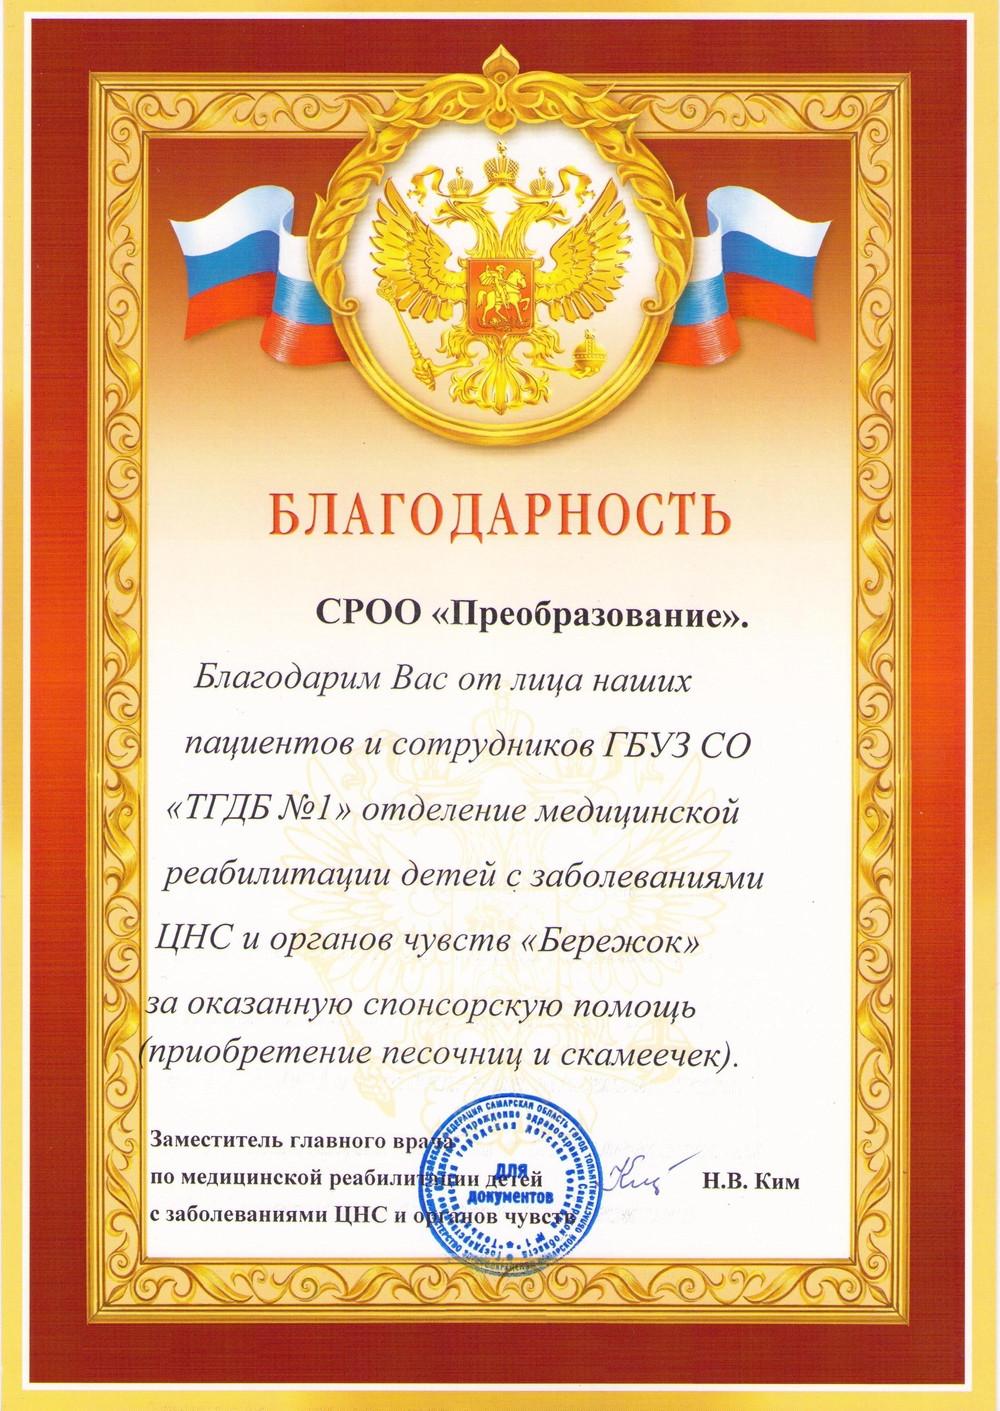 1000-www.preobrazovanie63.ru-4d74ee5b81a5891b4f0616fb3ab210b6.jpg